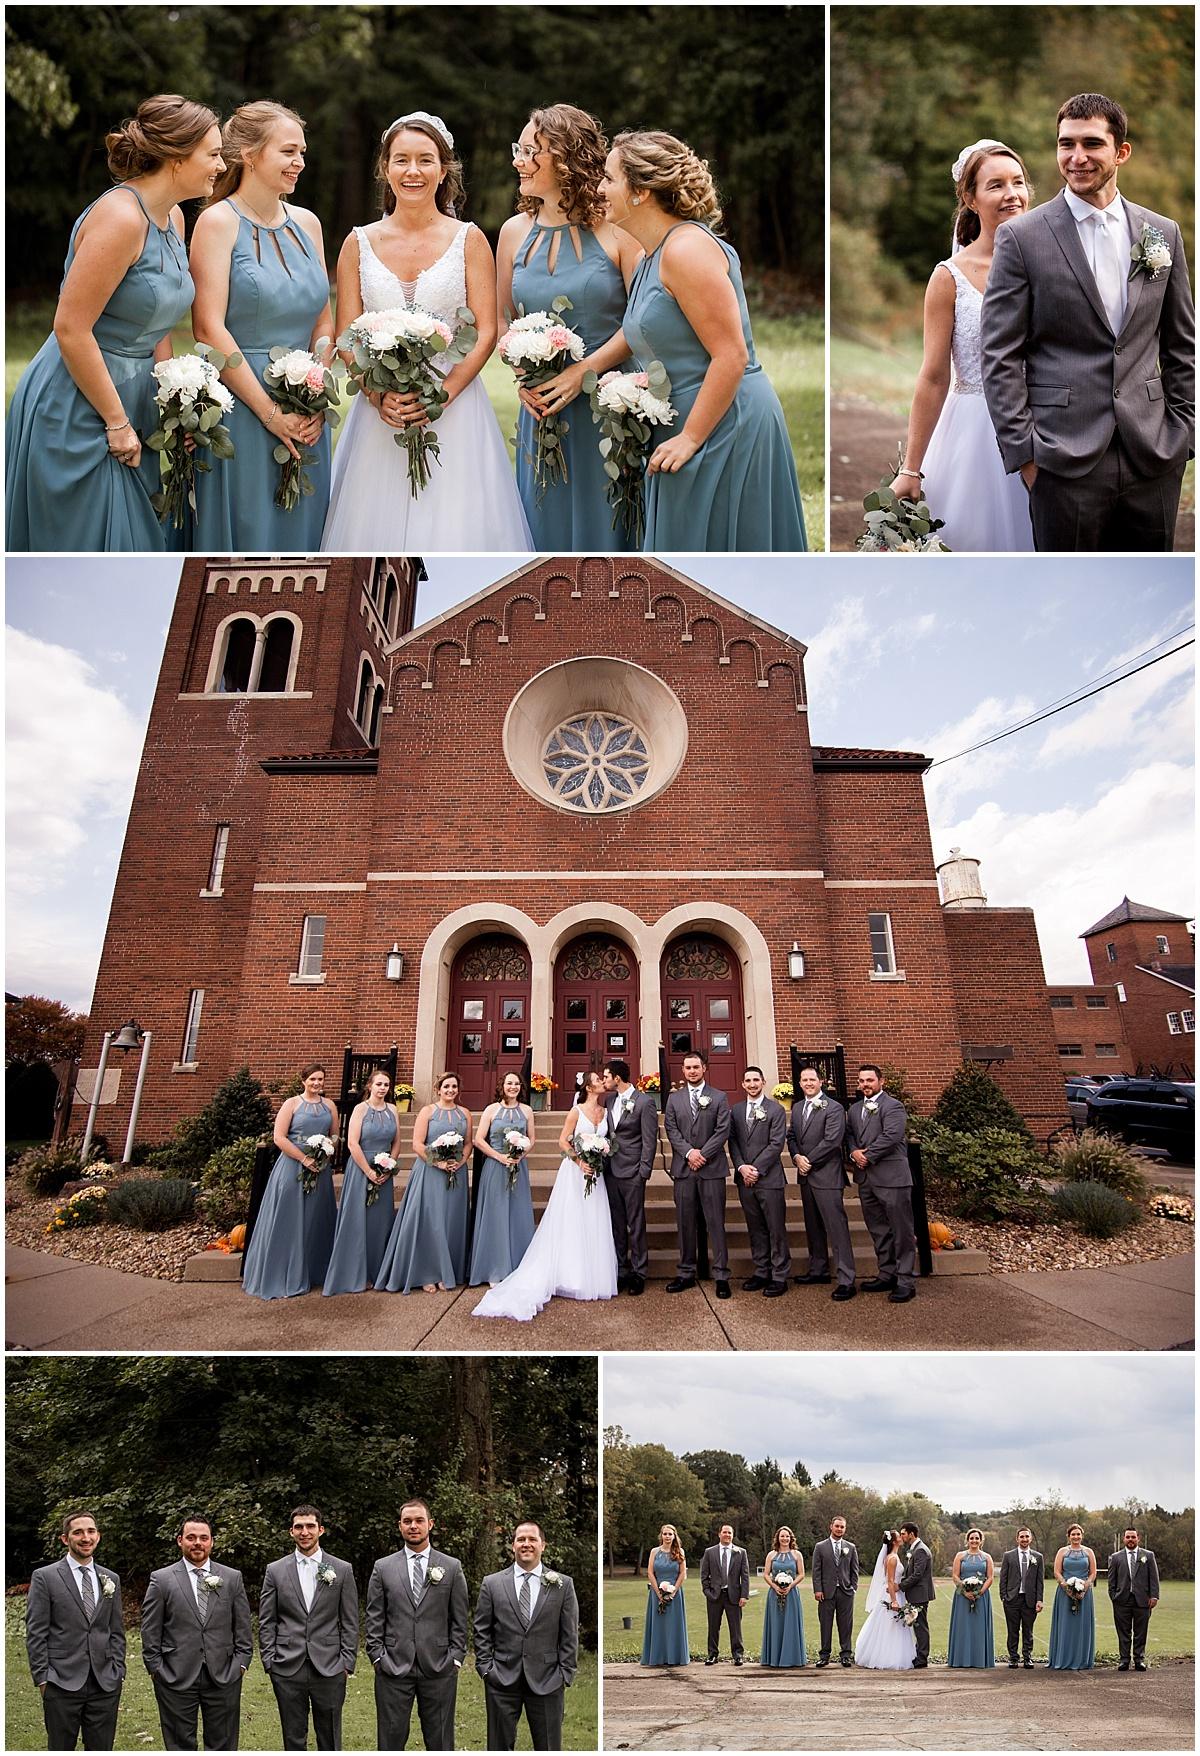 wedding party photos at st mary church herman pa